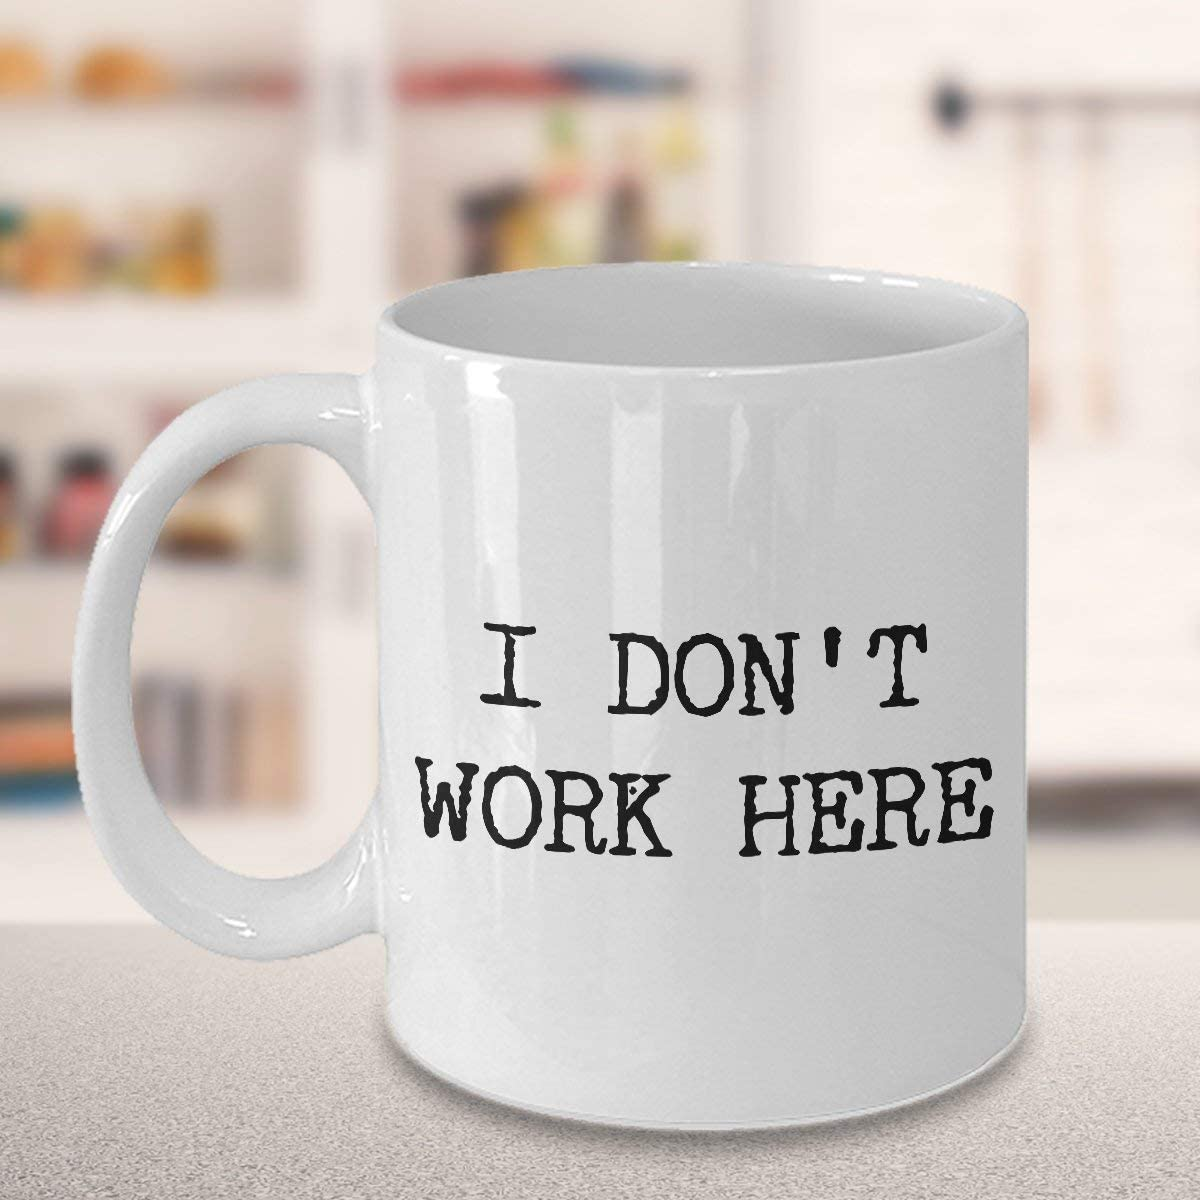 I Don't Work Here Mug Funny Coworker Gift Coworker Coffee Mug Work Coffee Mug Work Gifts for Men Work Gifts for Women Ceramic Coffee Cup